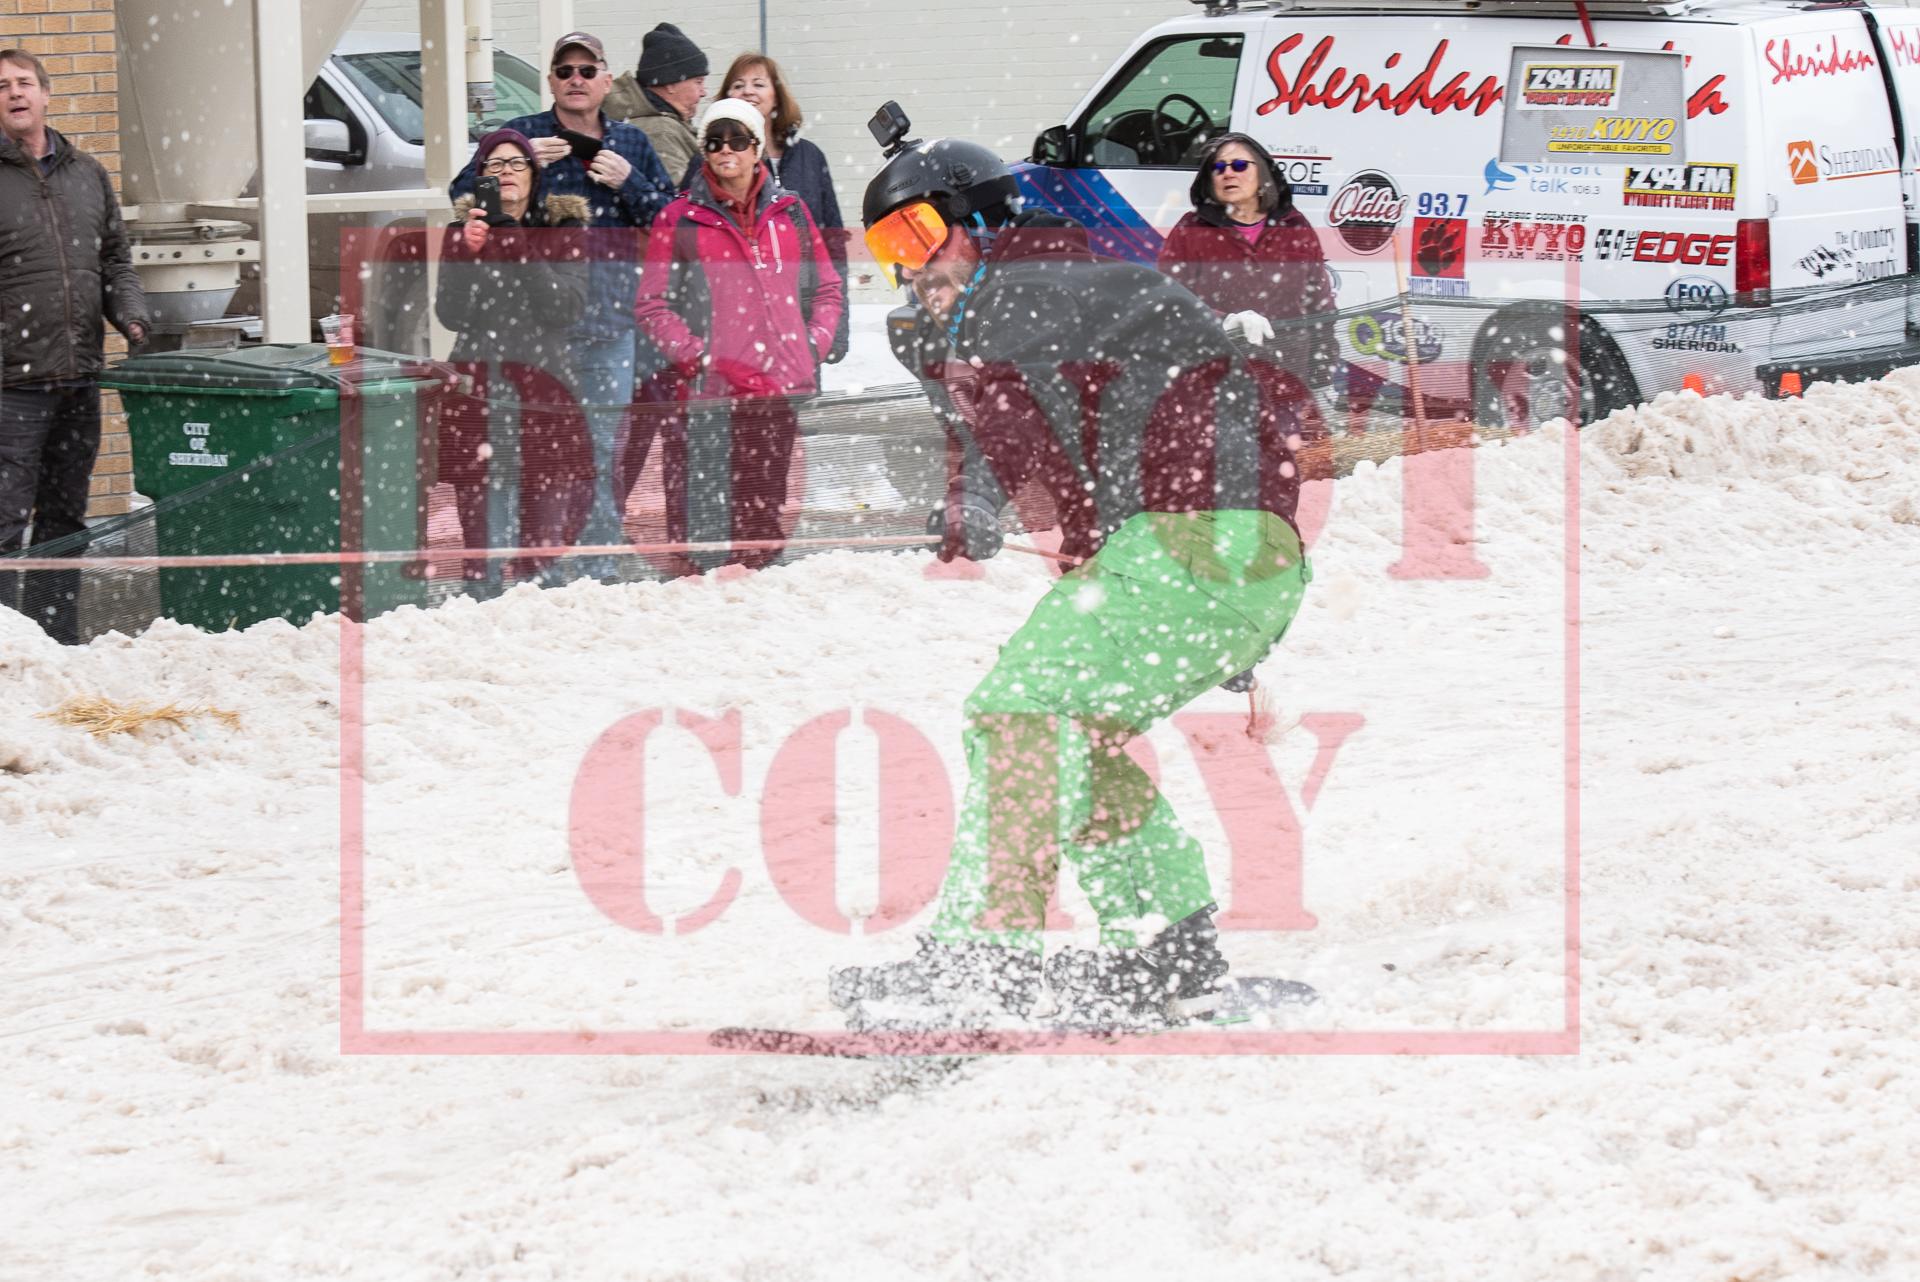 - Kelley Portwine - Snowboard 3